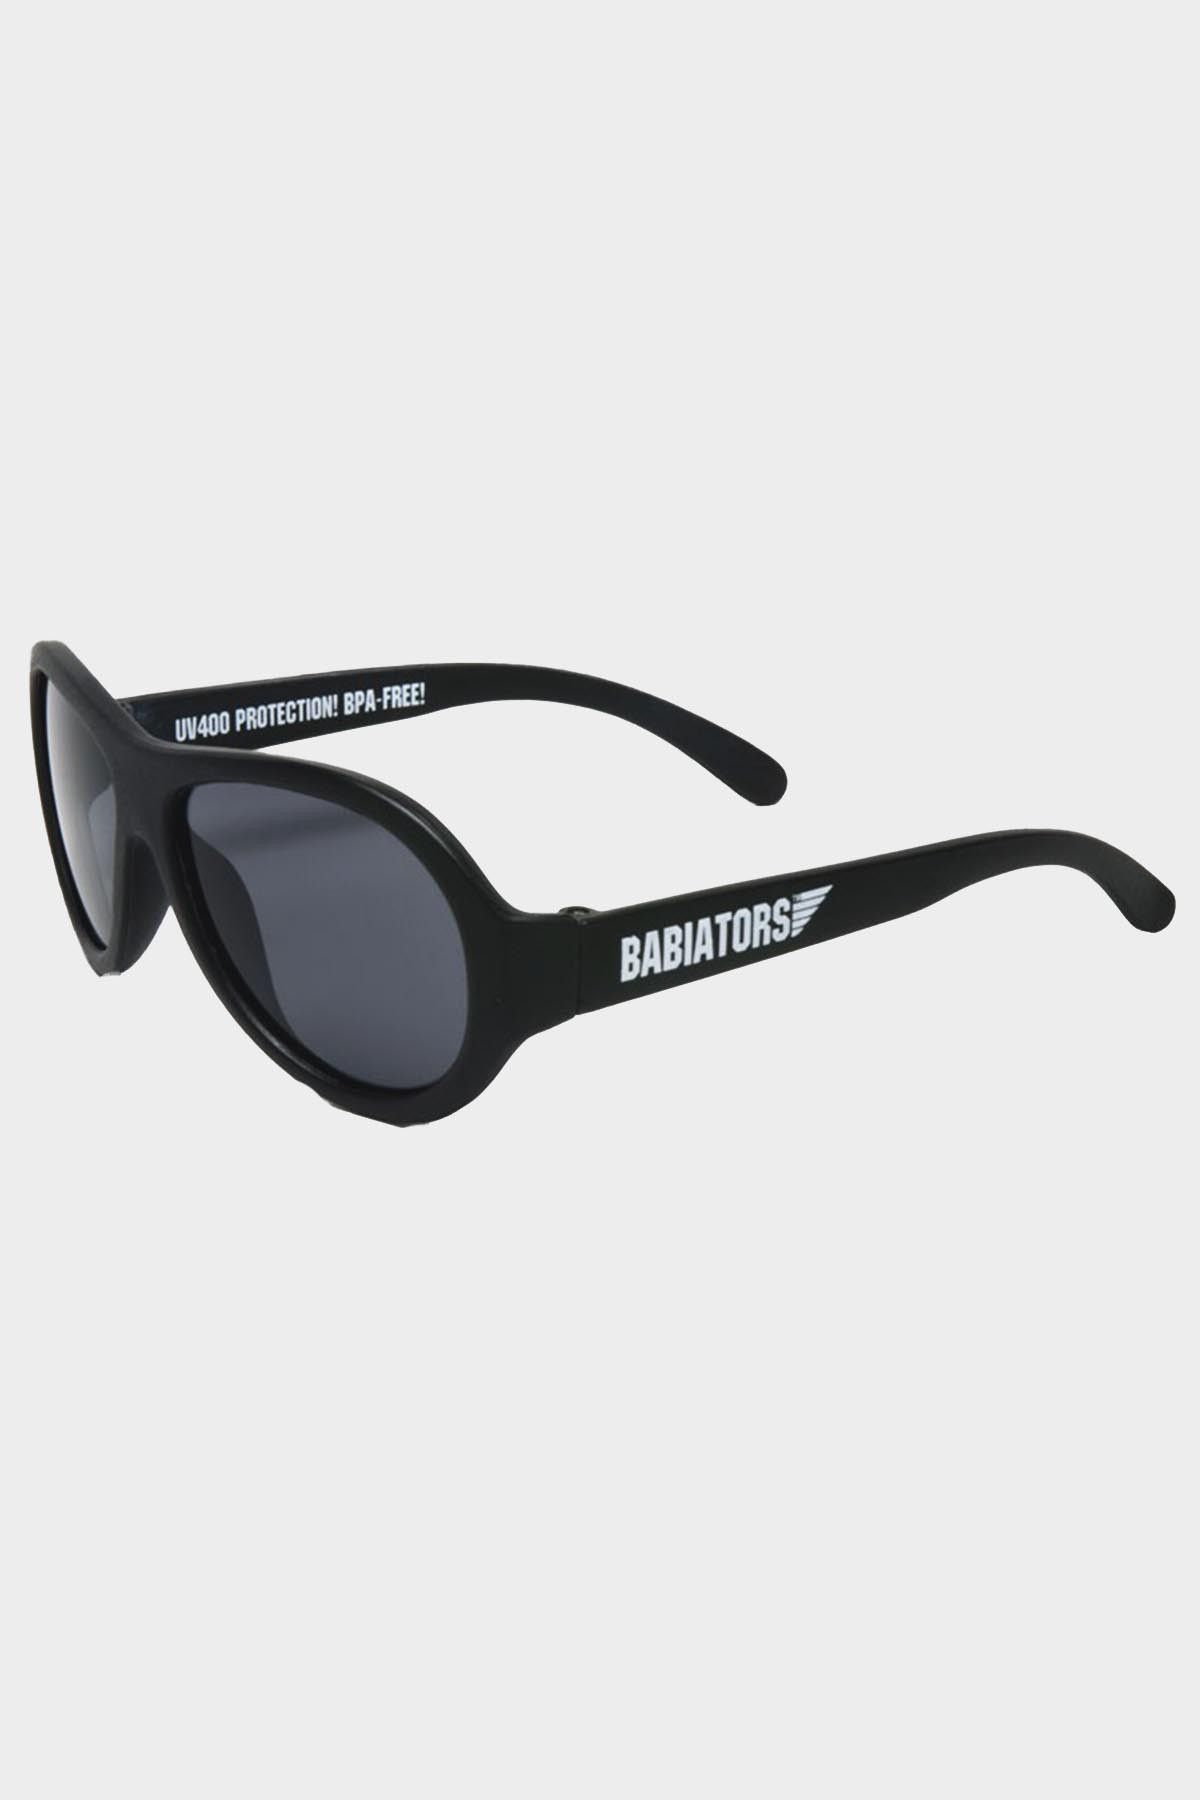 Babiators- Black   Products   Pinterest 077b867a8c15